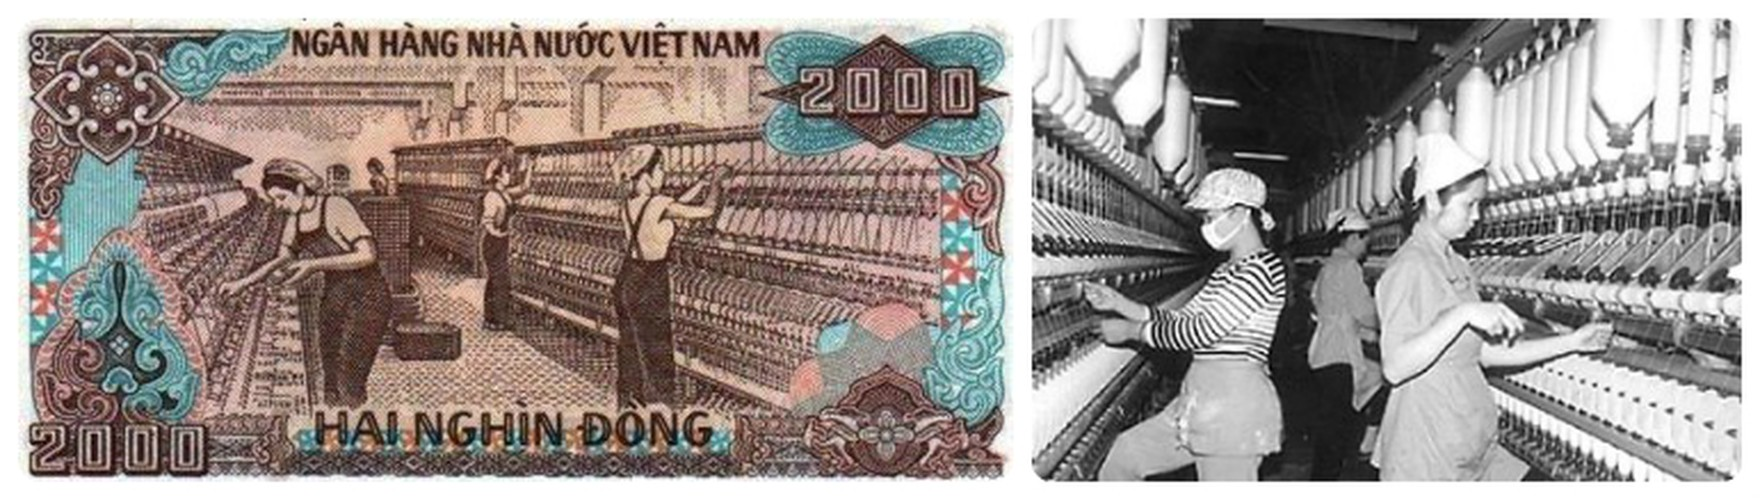 Giai ma tat tat dia danh in tren tien Viet Nam-Hinh-4